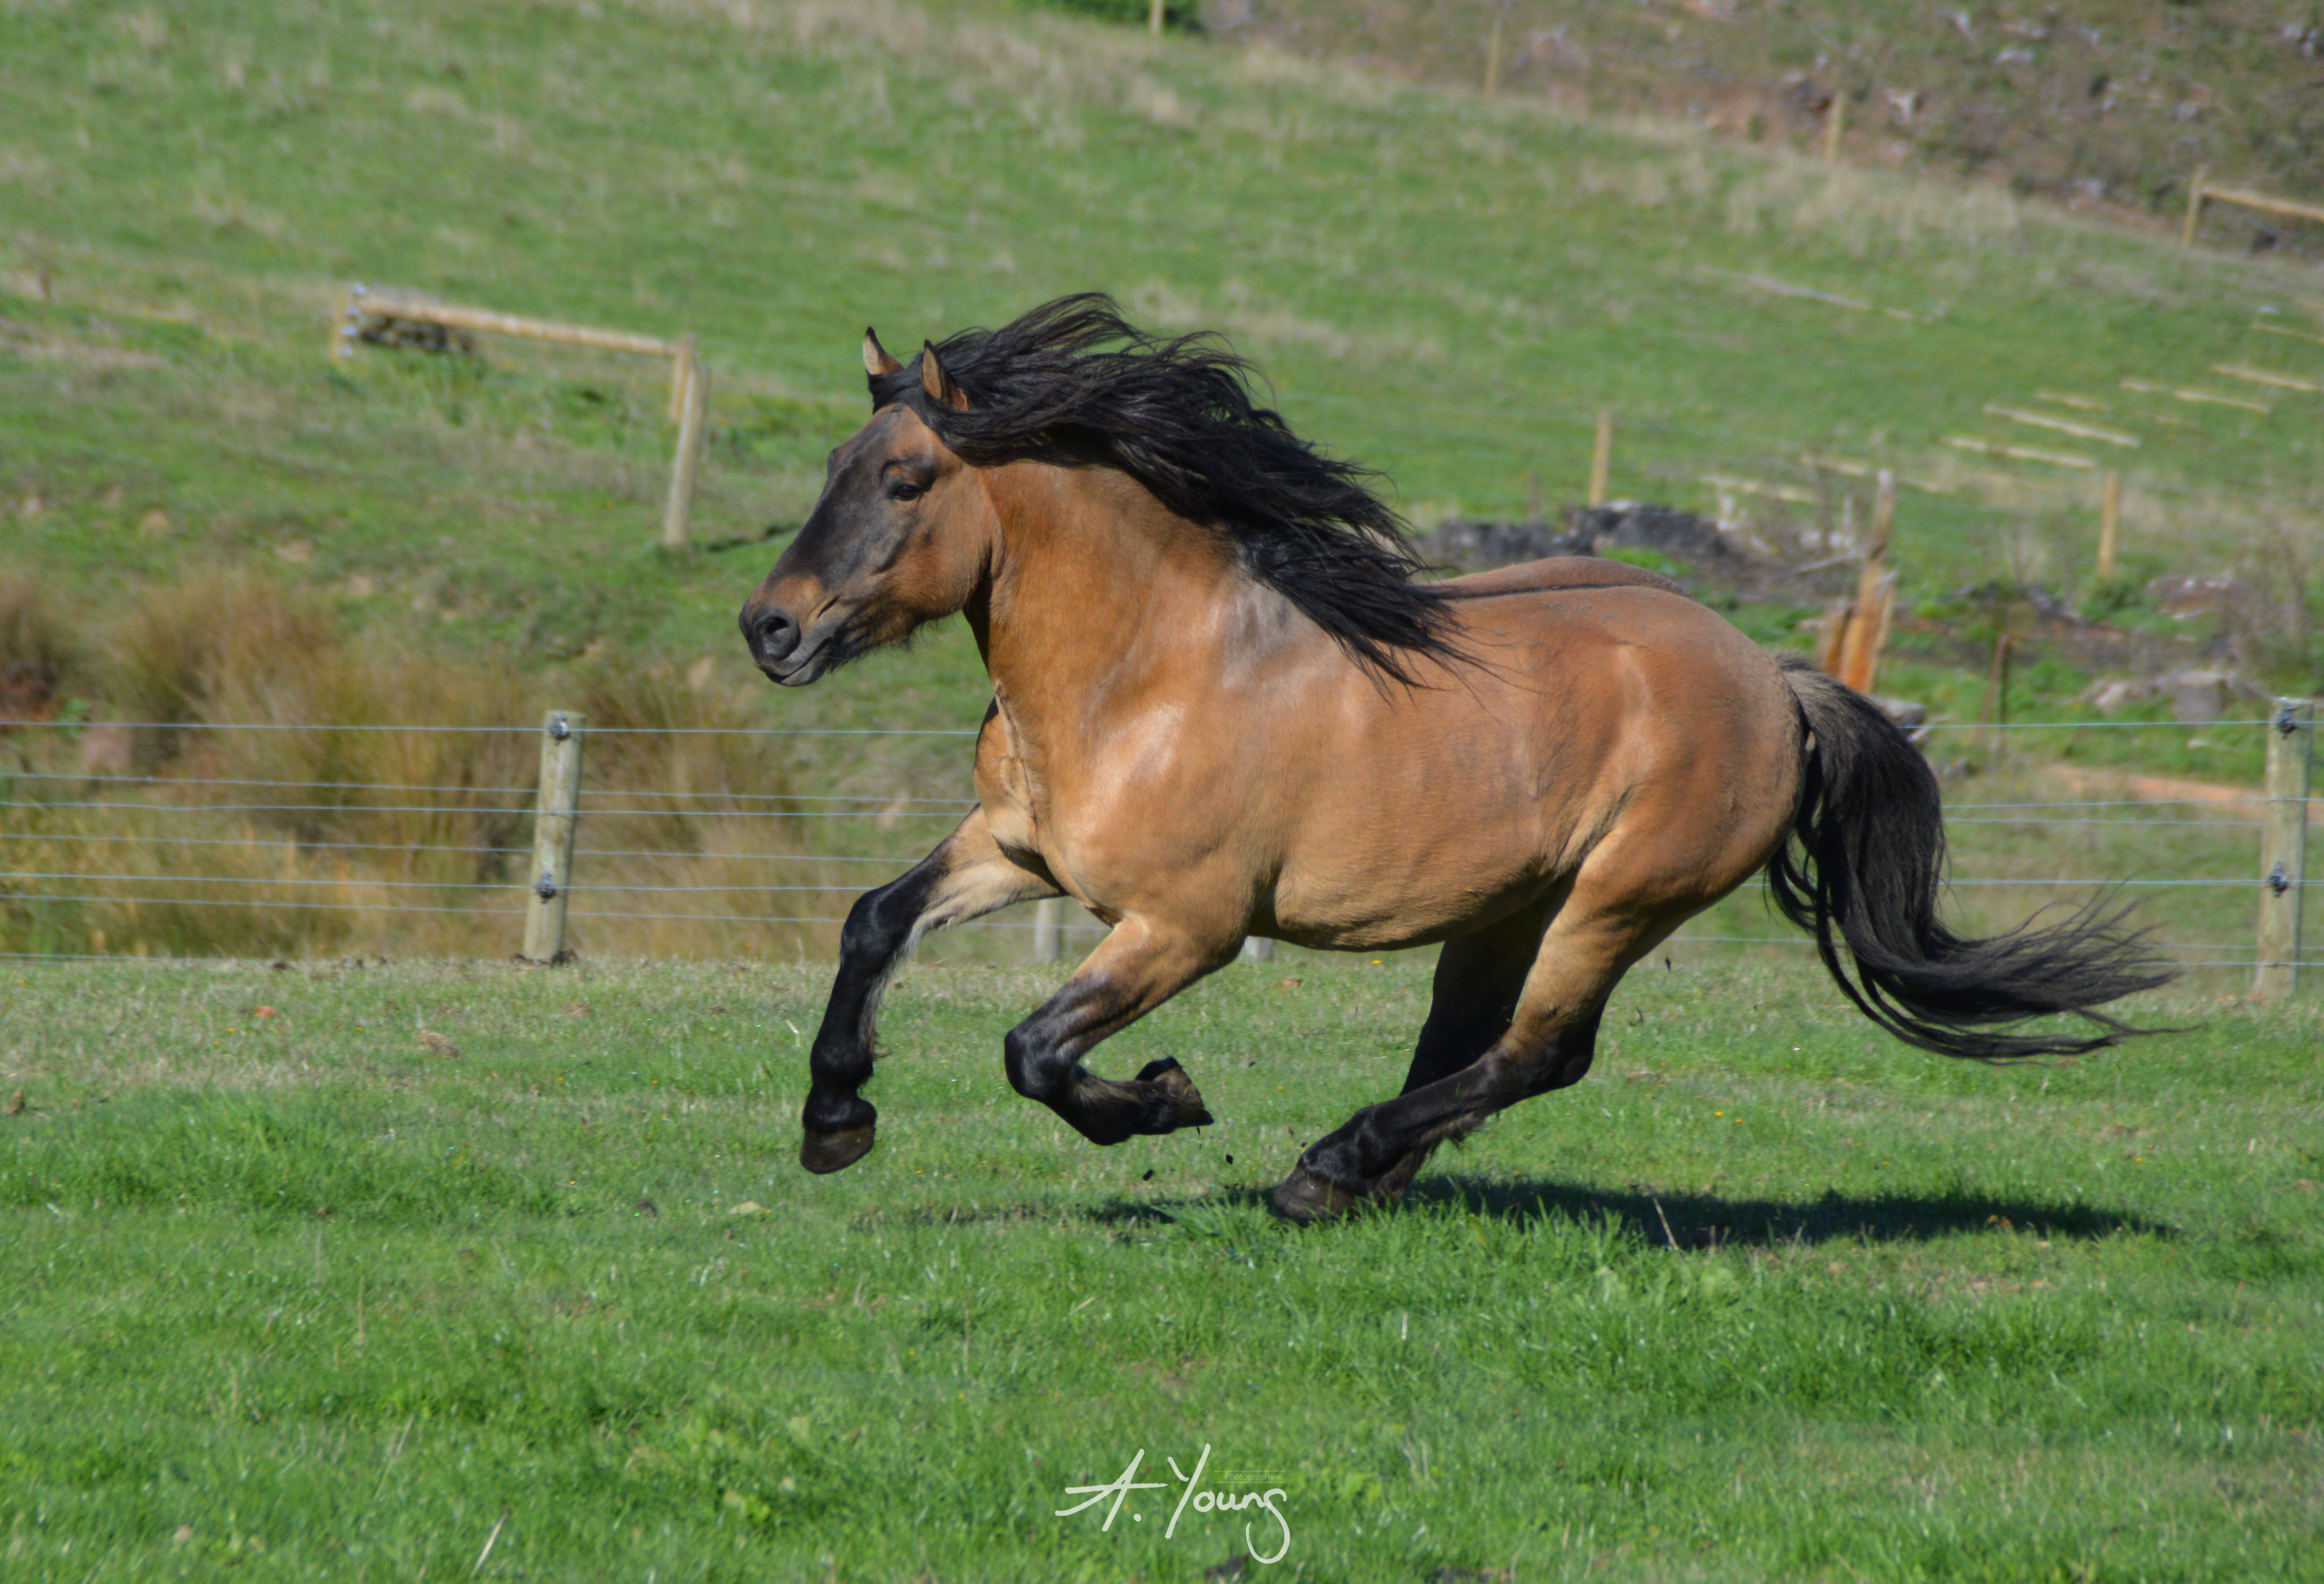 Beinn kaldy, highland pony, stallion, yellow dun, galloping